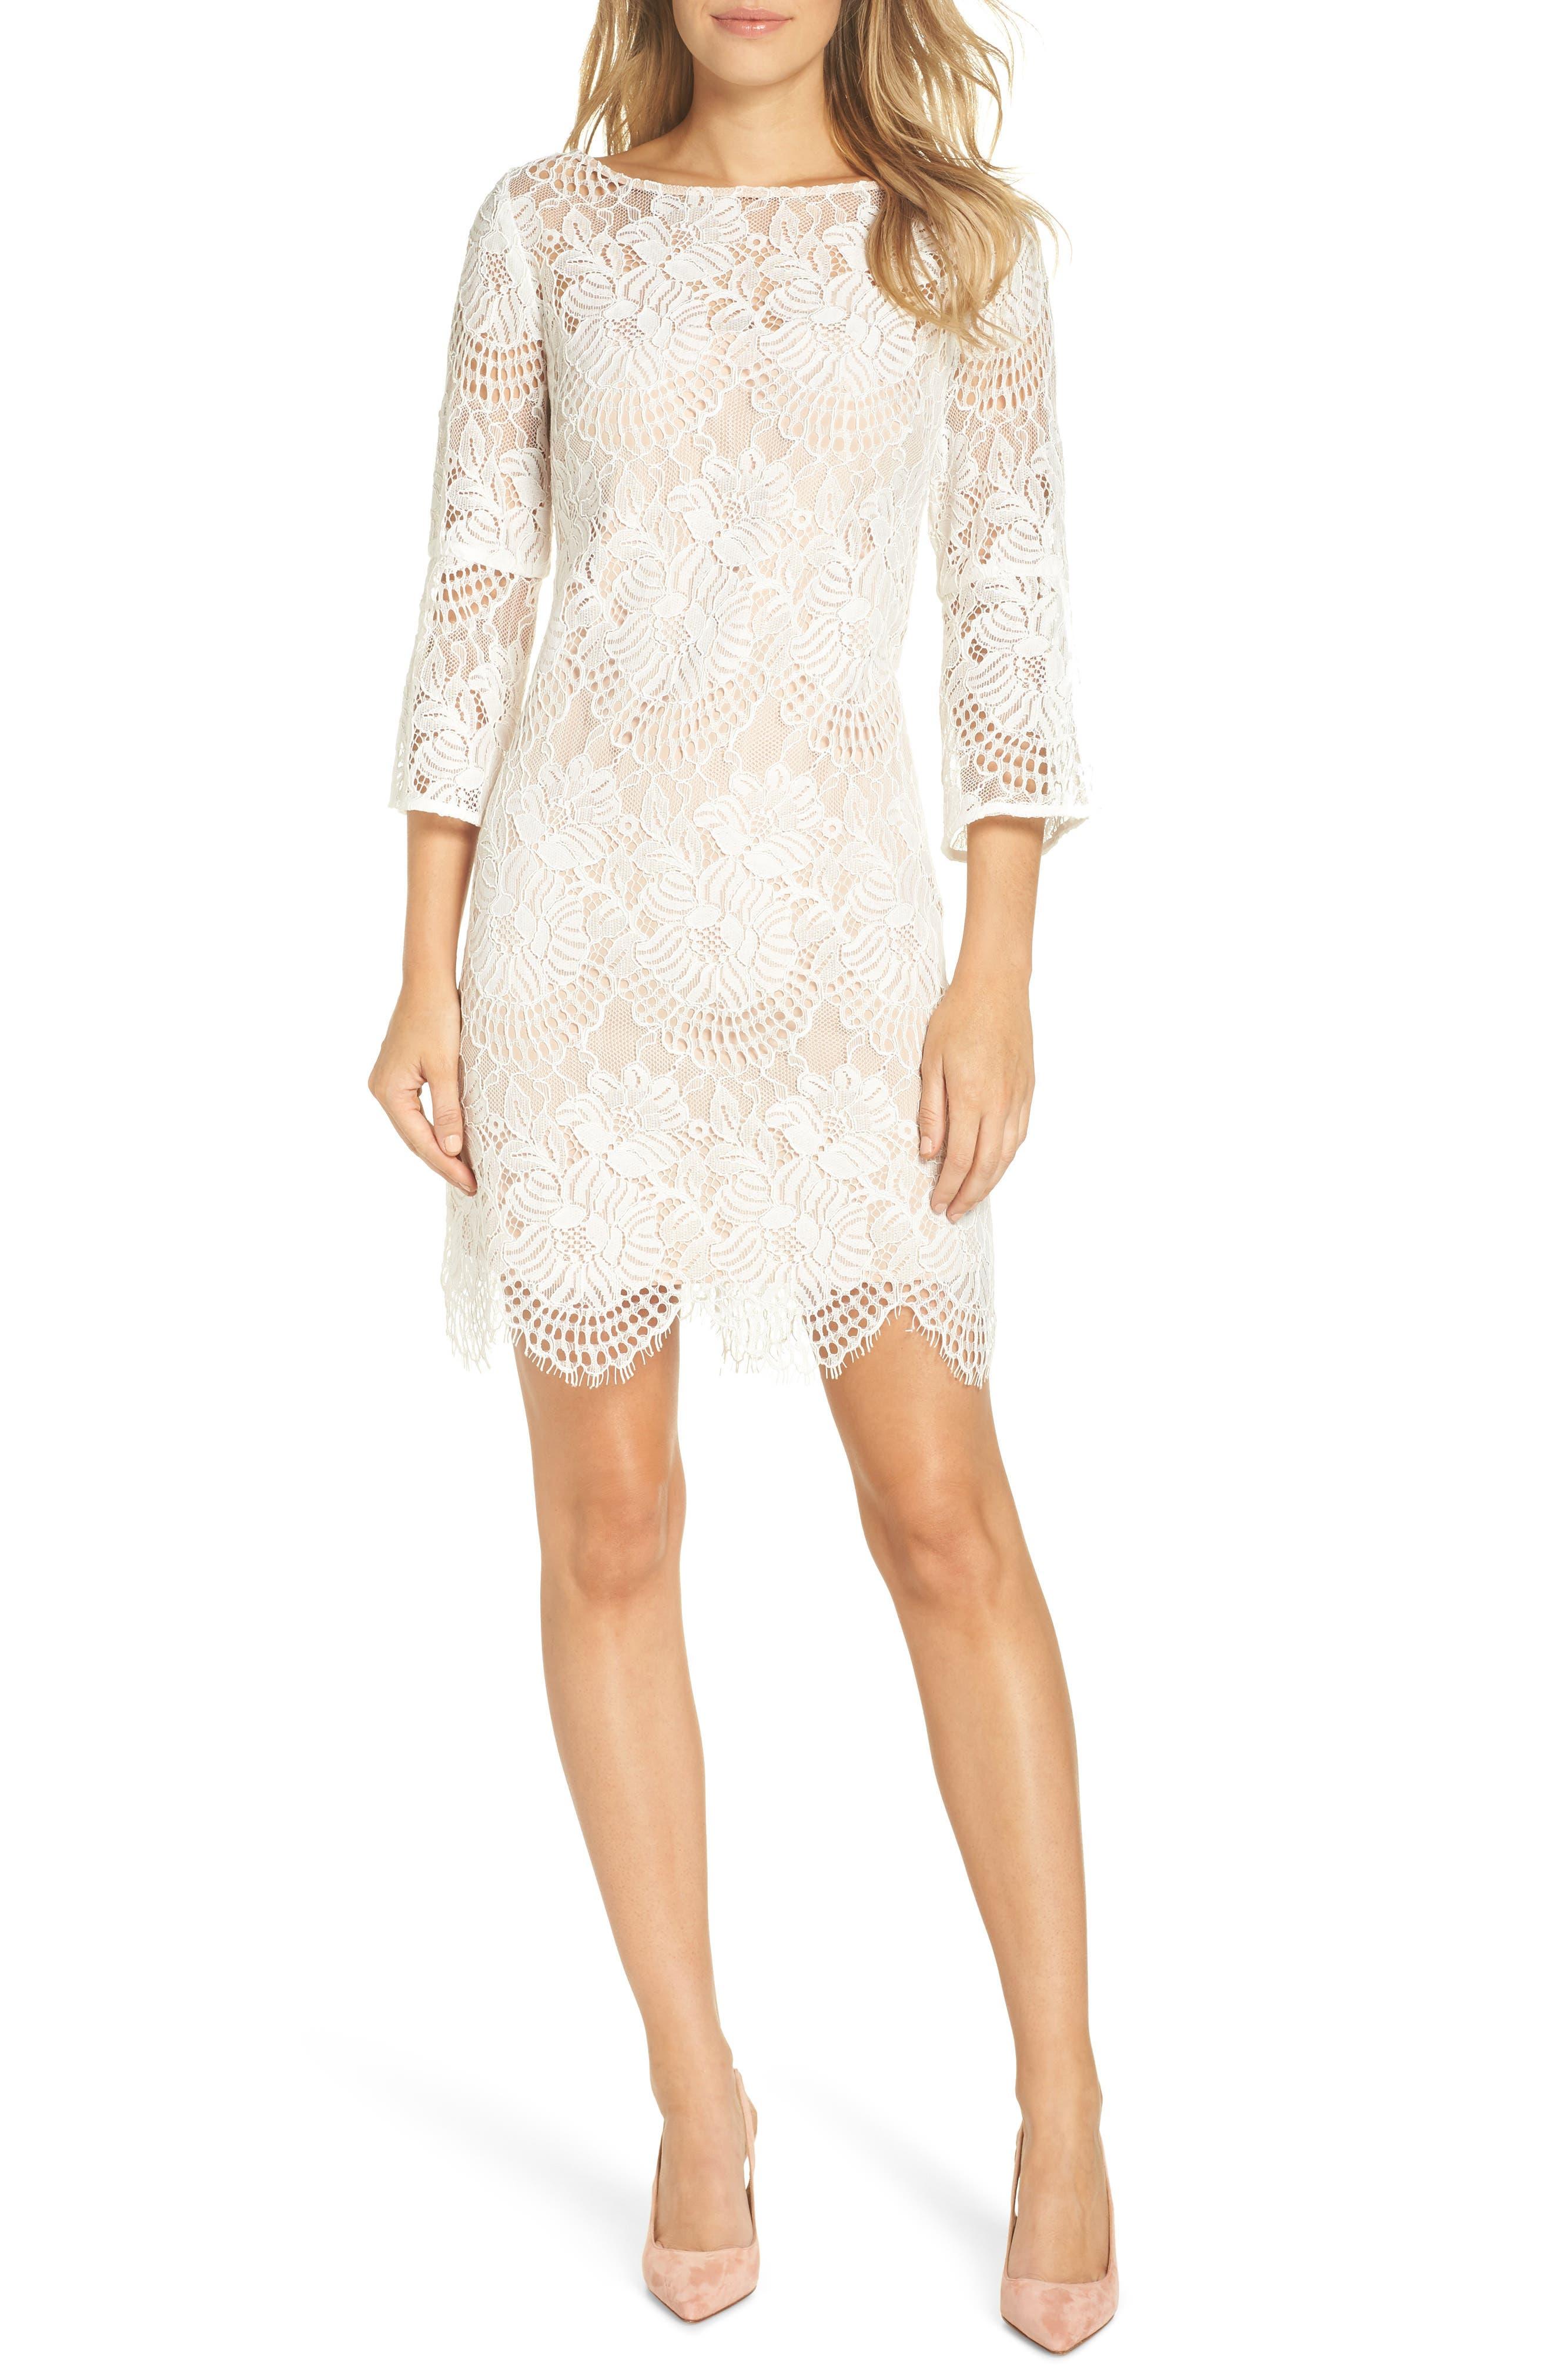 VINCE CAMUTO Lace Shift Dress, Main, color, IVORY